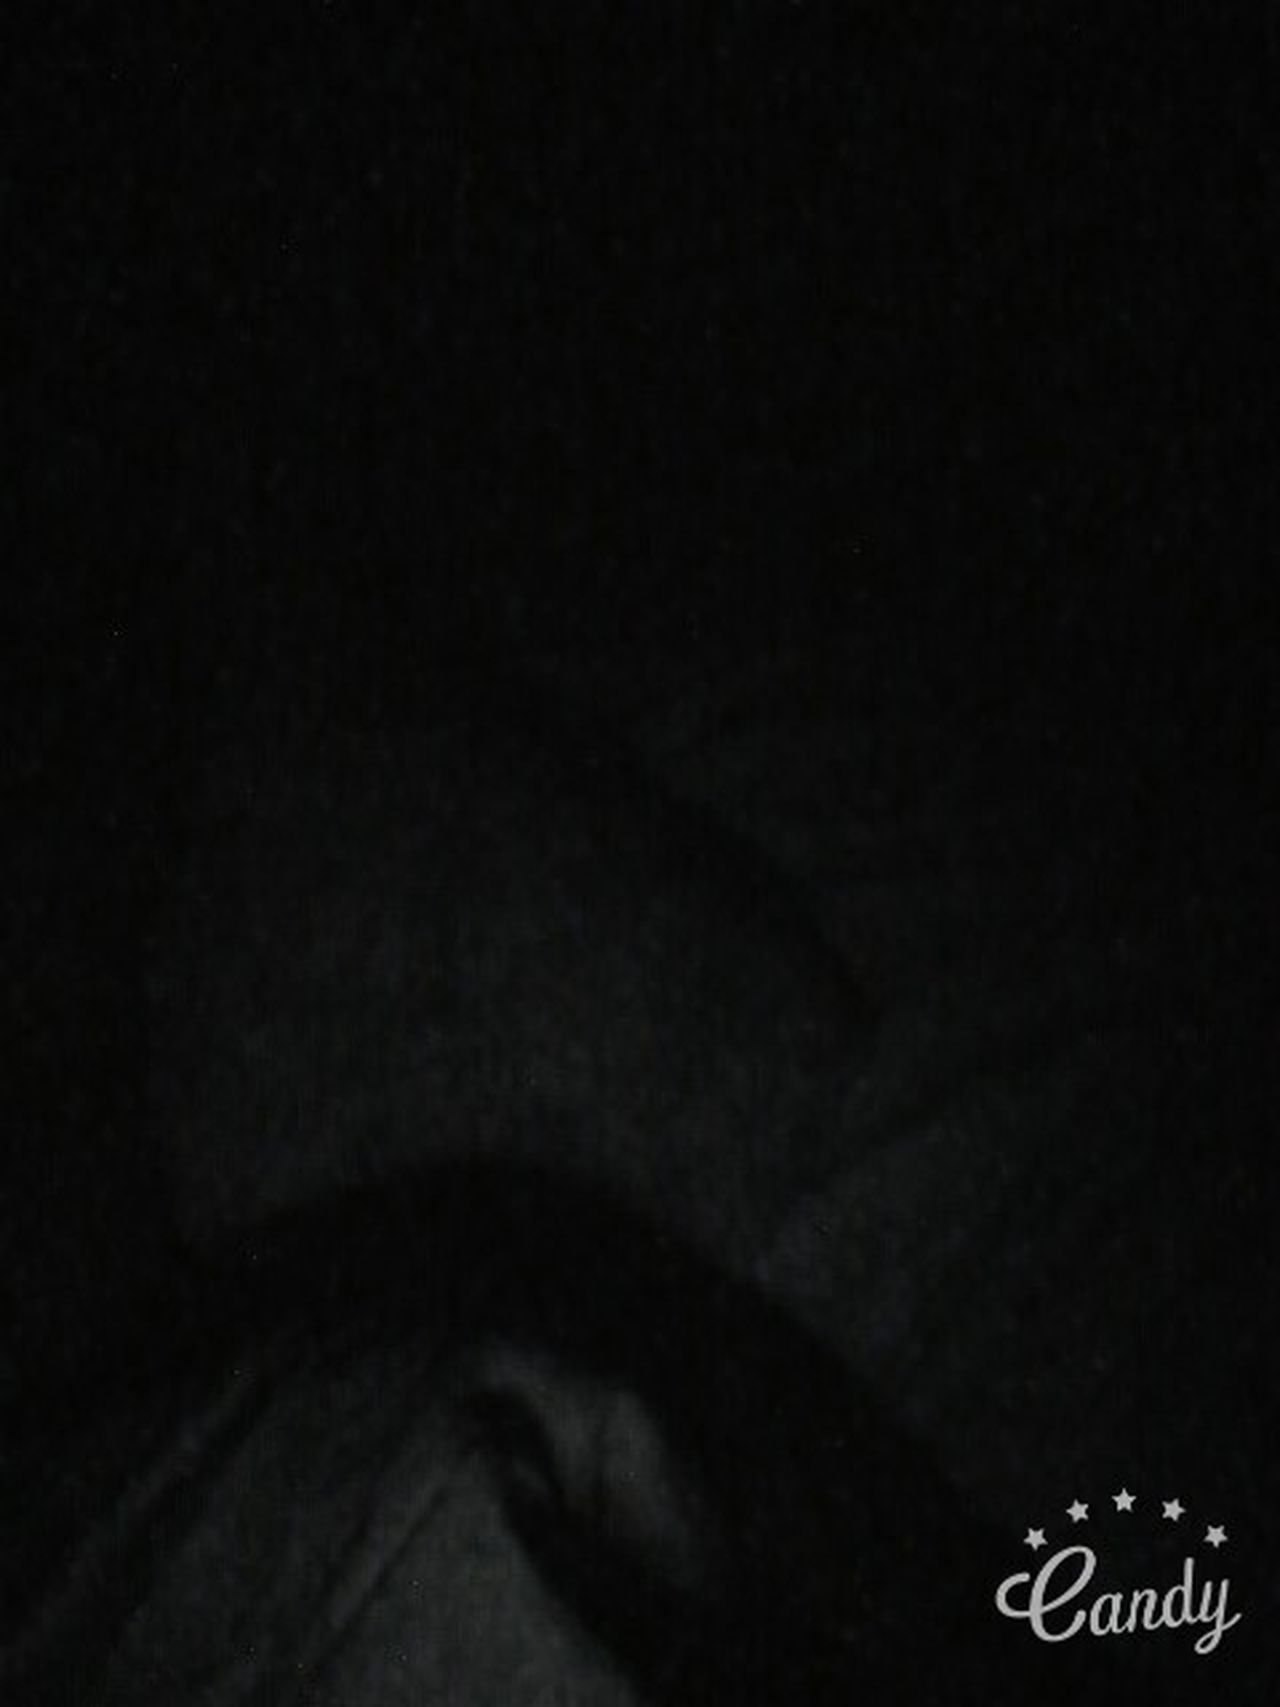 Dark No People Night Black Background Indoors  Close-up Goodnight Gooddreamstonight